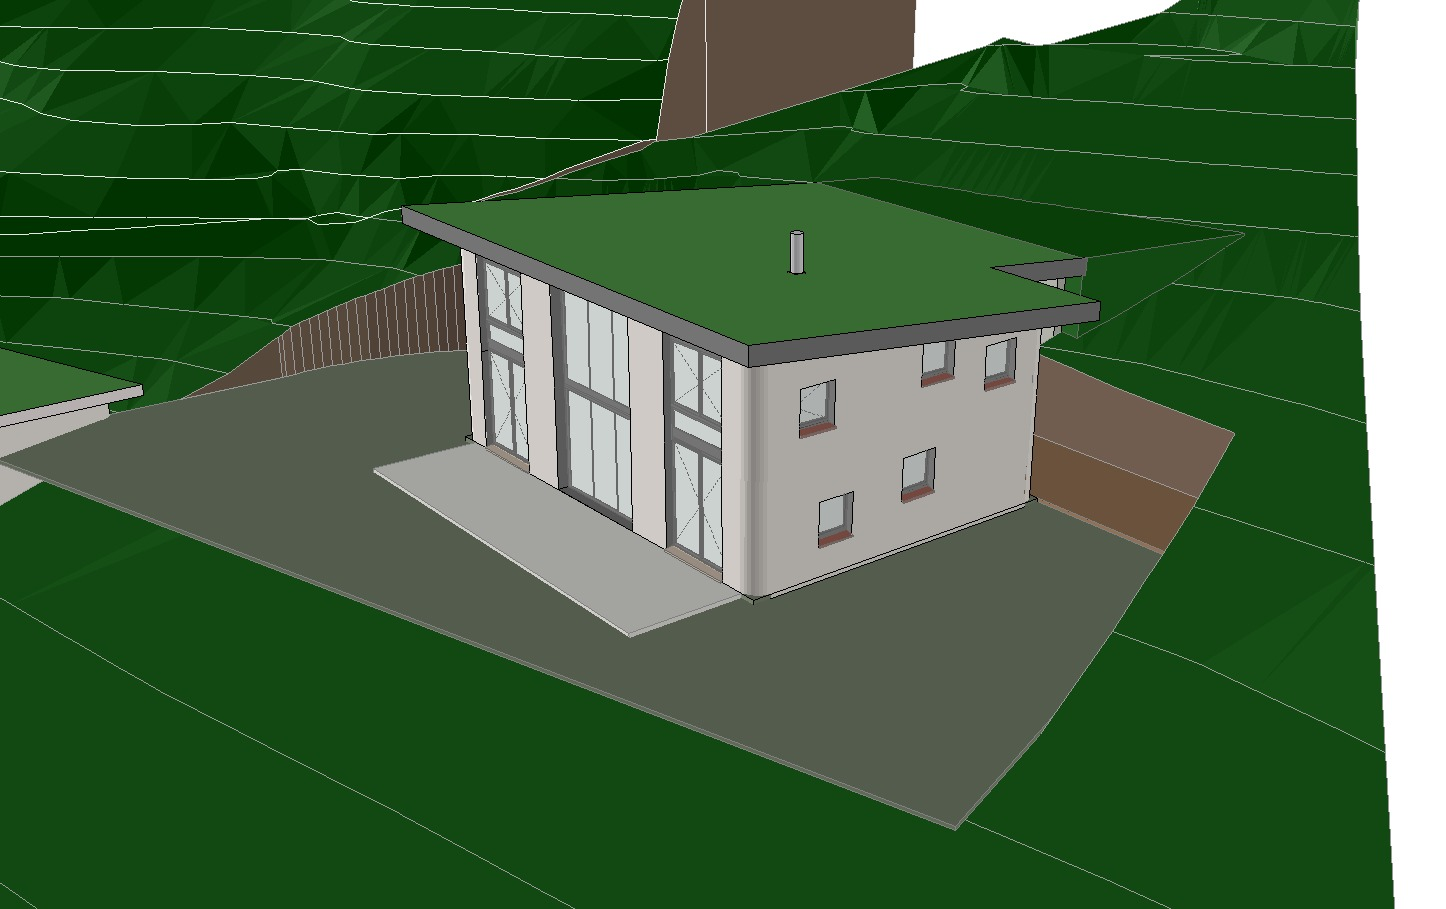 blender pour la mod lisation matthieu dupont de dinechin architecte dplg. Black Bedroom Furniture Sets. Home Design Ideas